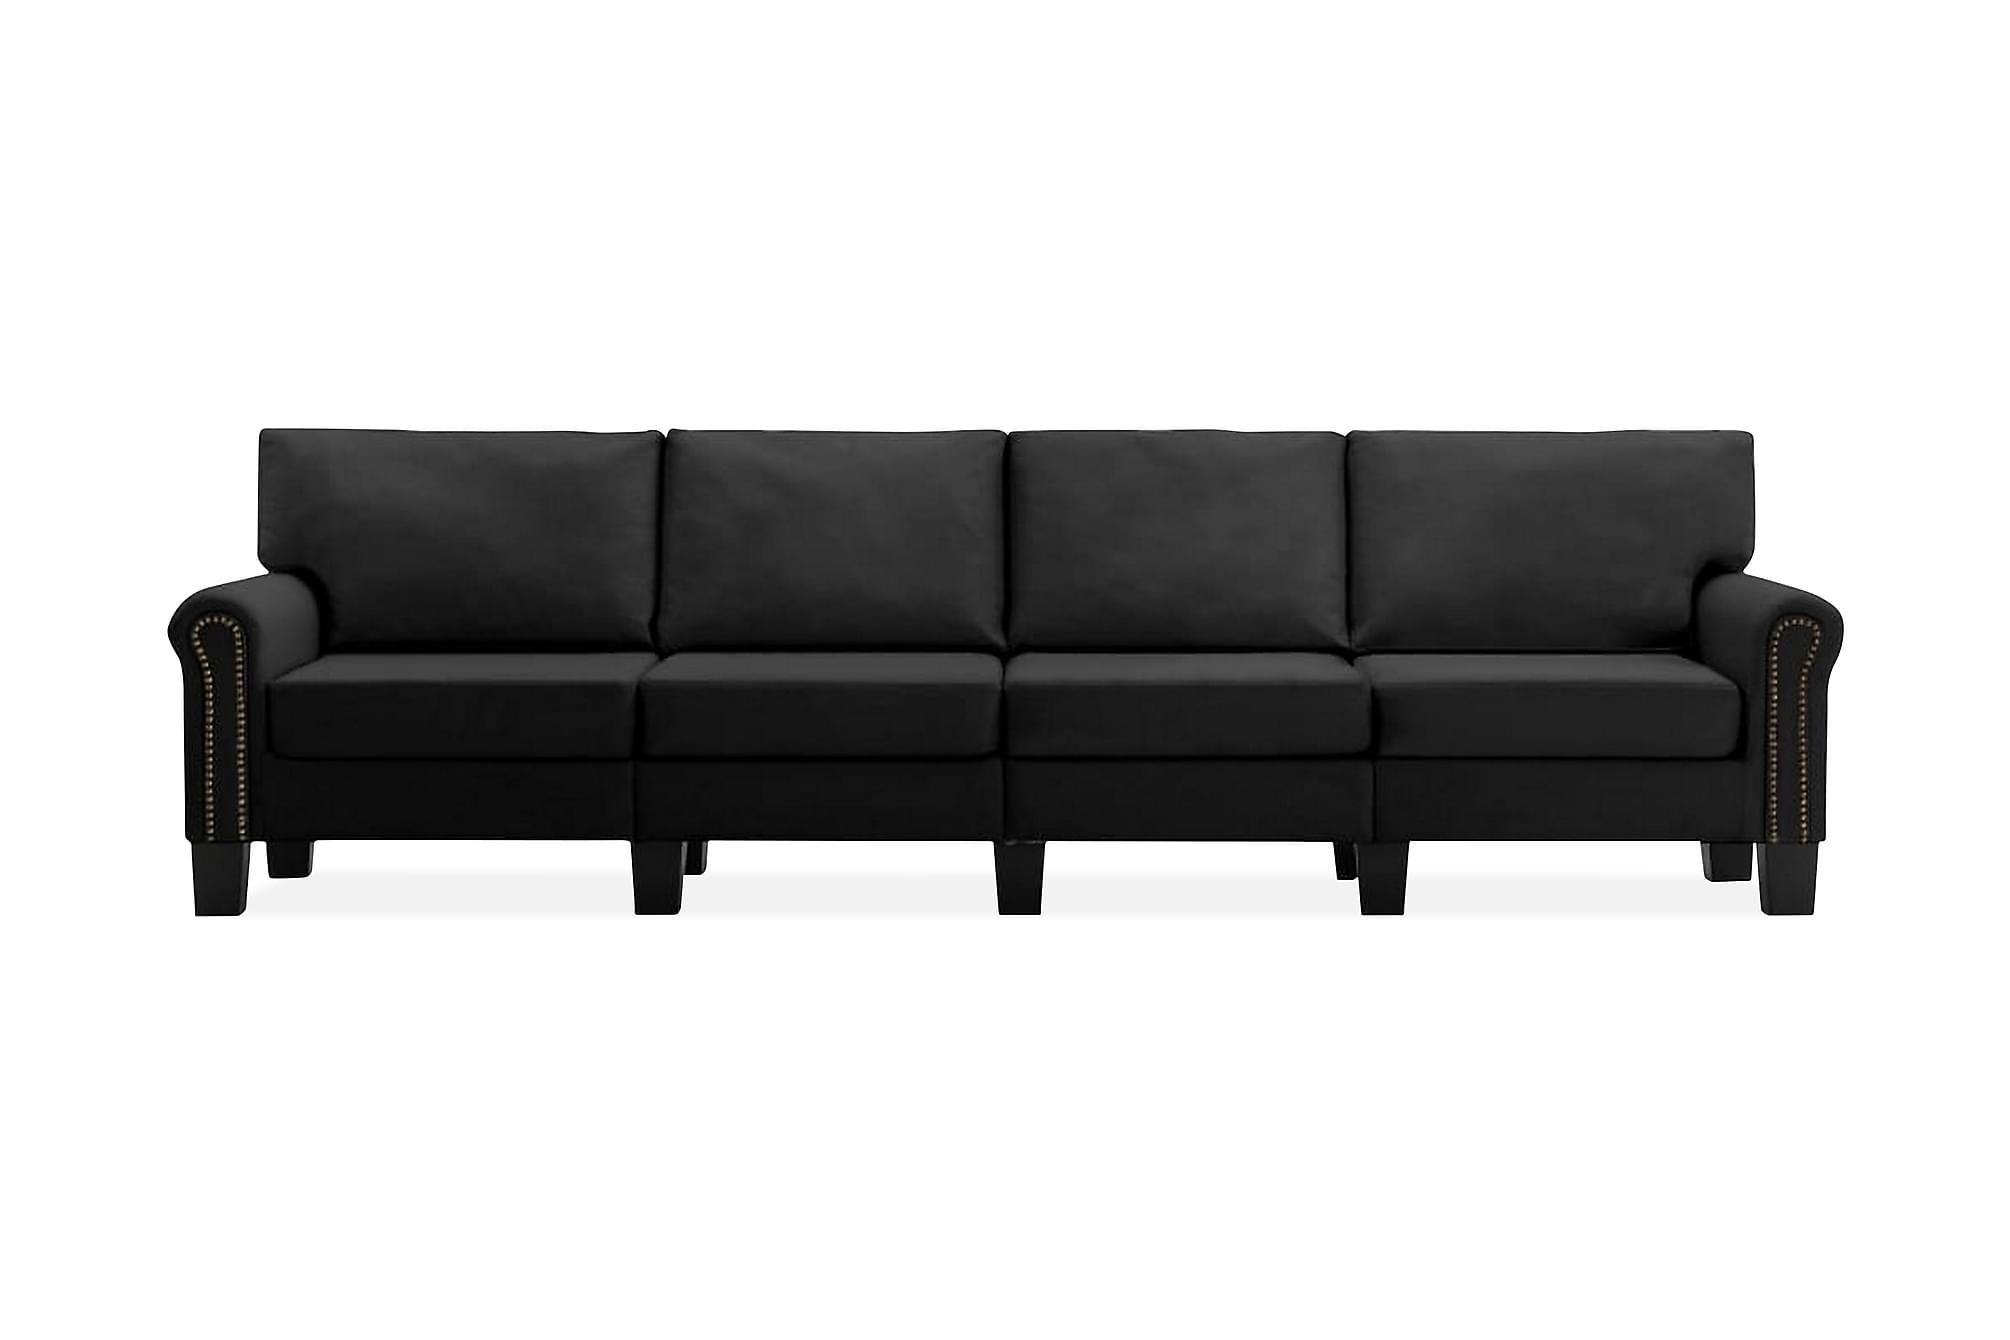 4-sitssoffa svart tyg